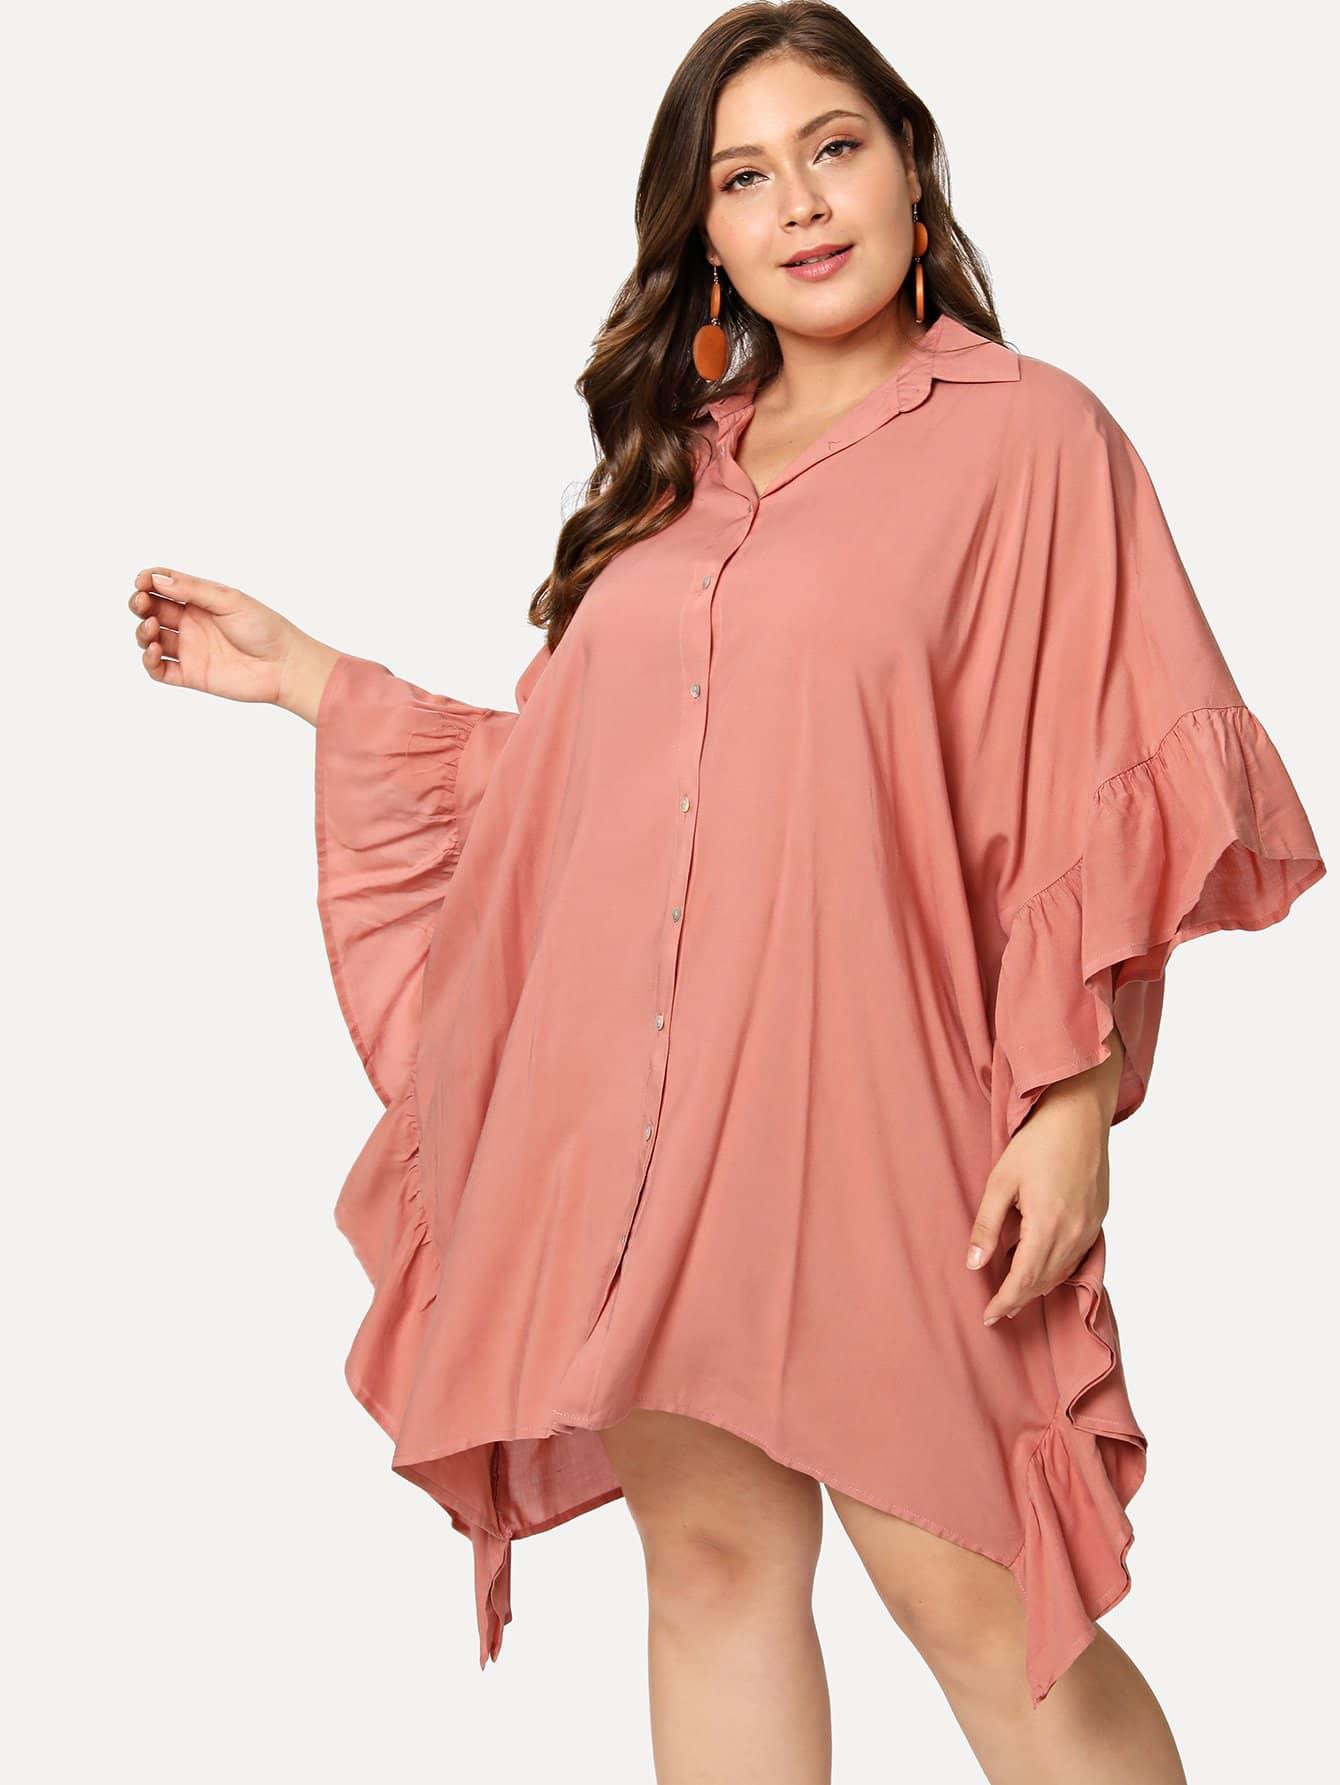 Ruffle Trim Batwing Sleeve Shirt Dress batwing sleeve pinstripe shirt dress